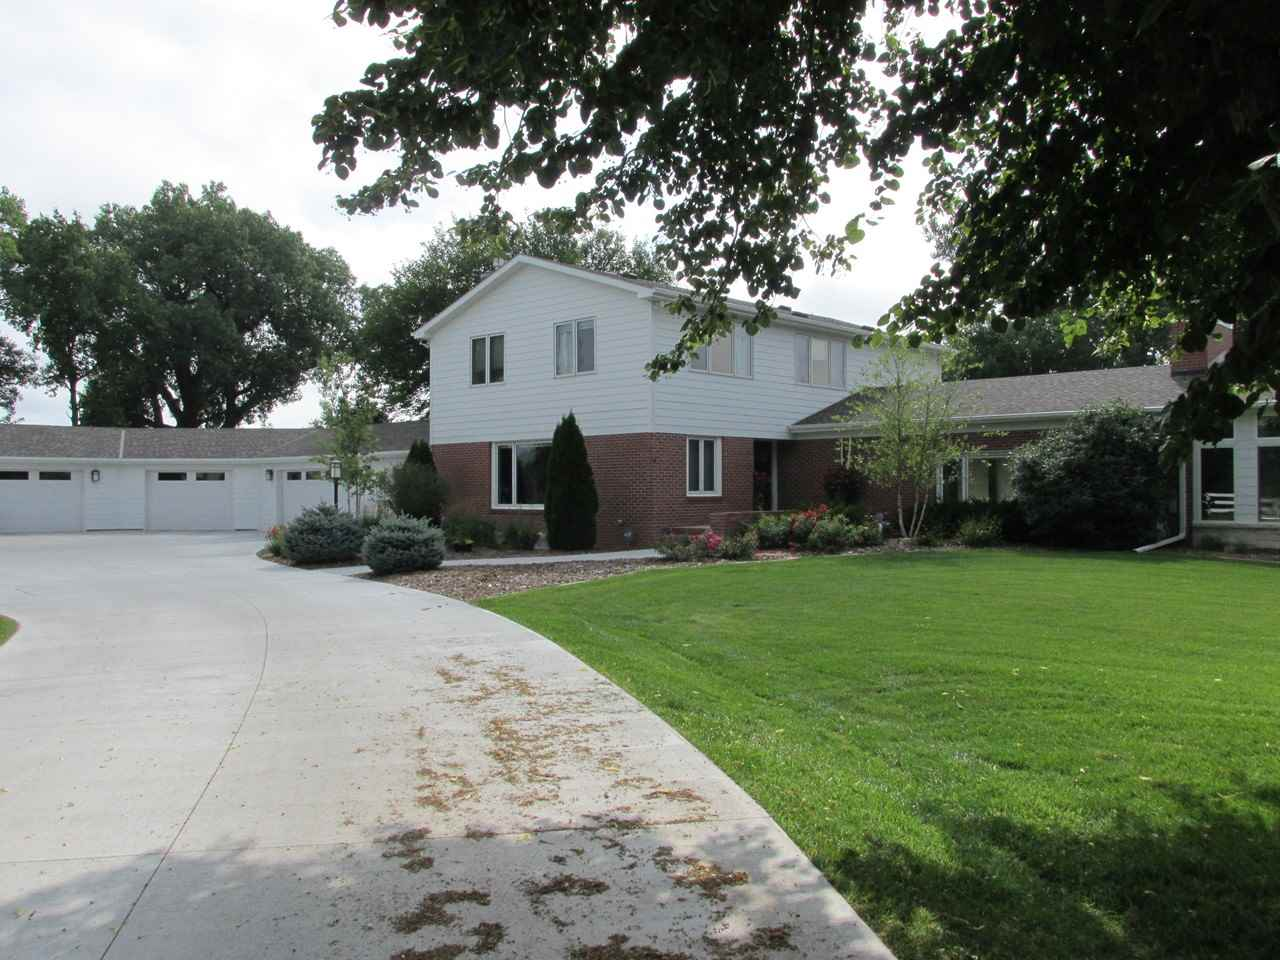 Real Estate for Sale, ListingId: 34535351, Hastings,NE68901